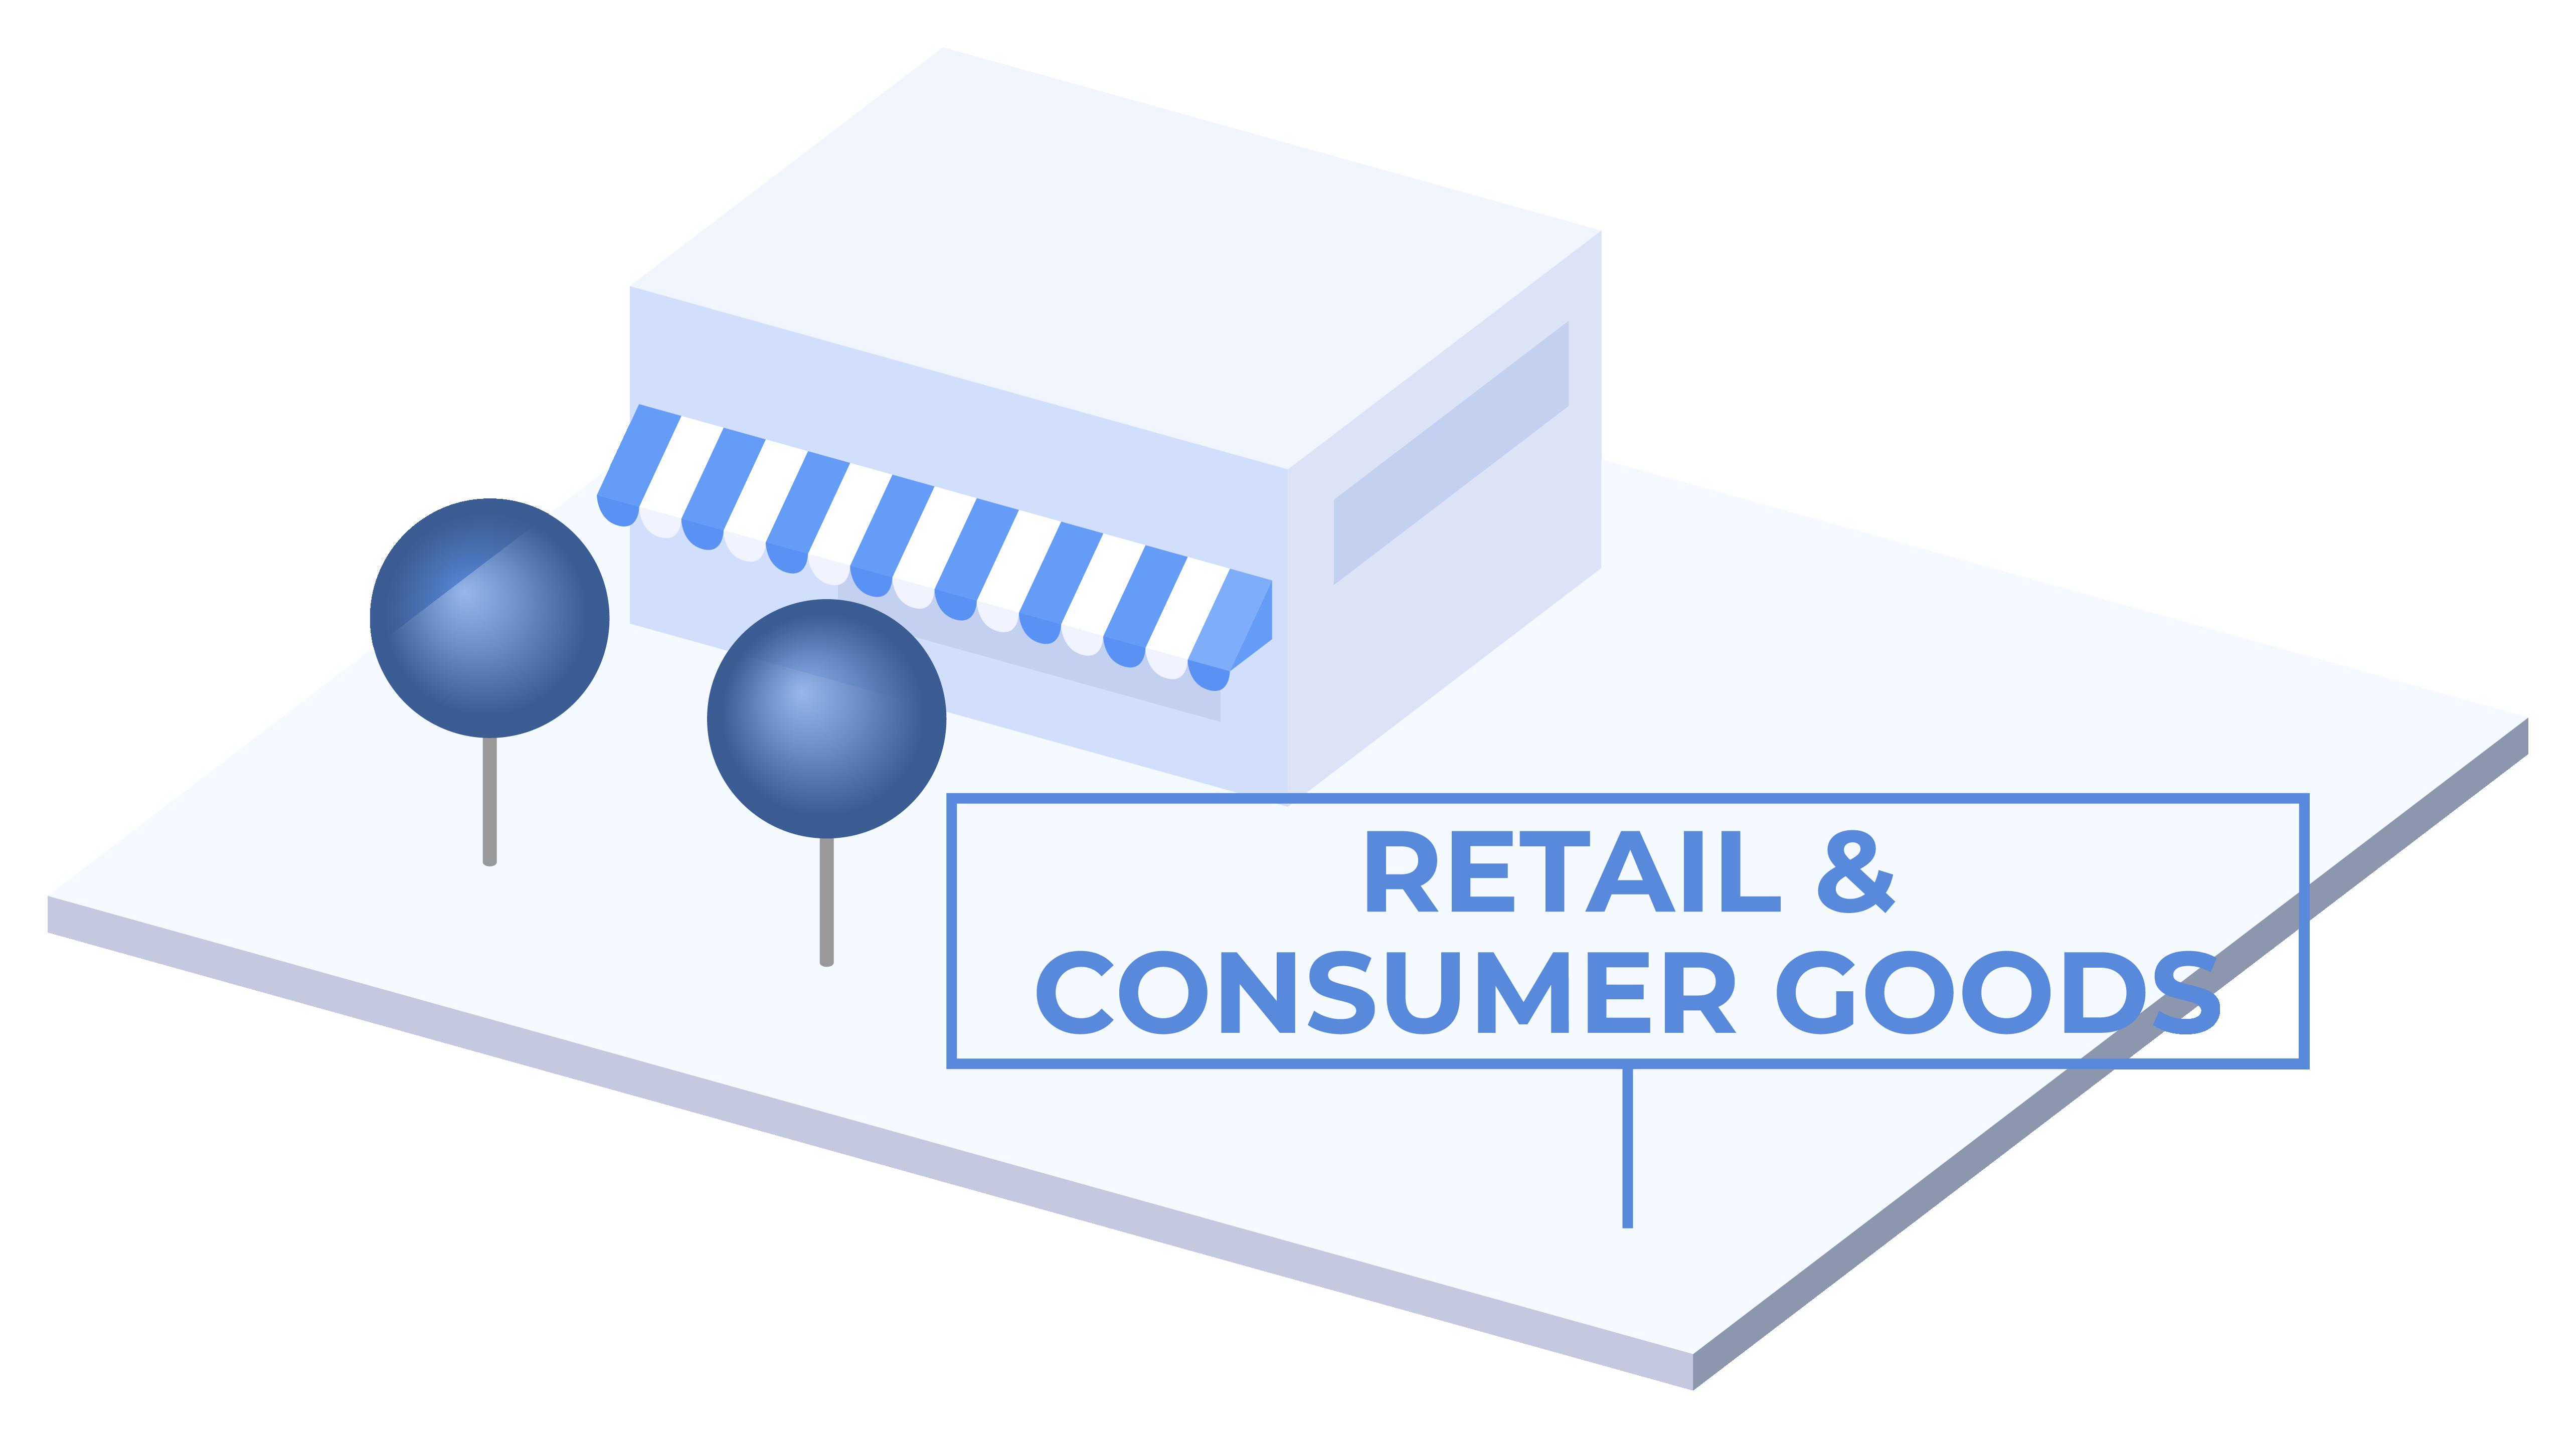 bismartcity responsive retailconsumergoods